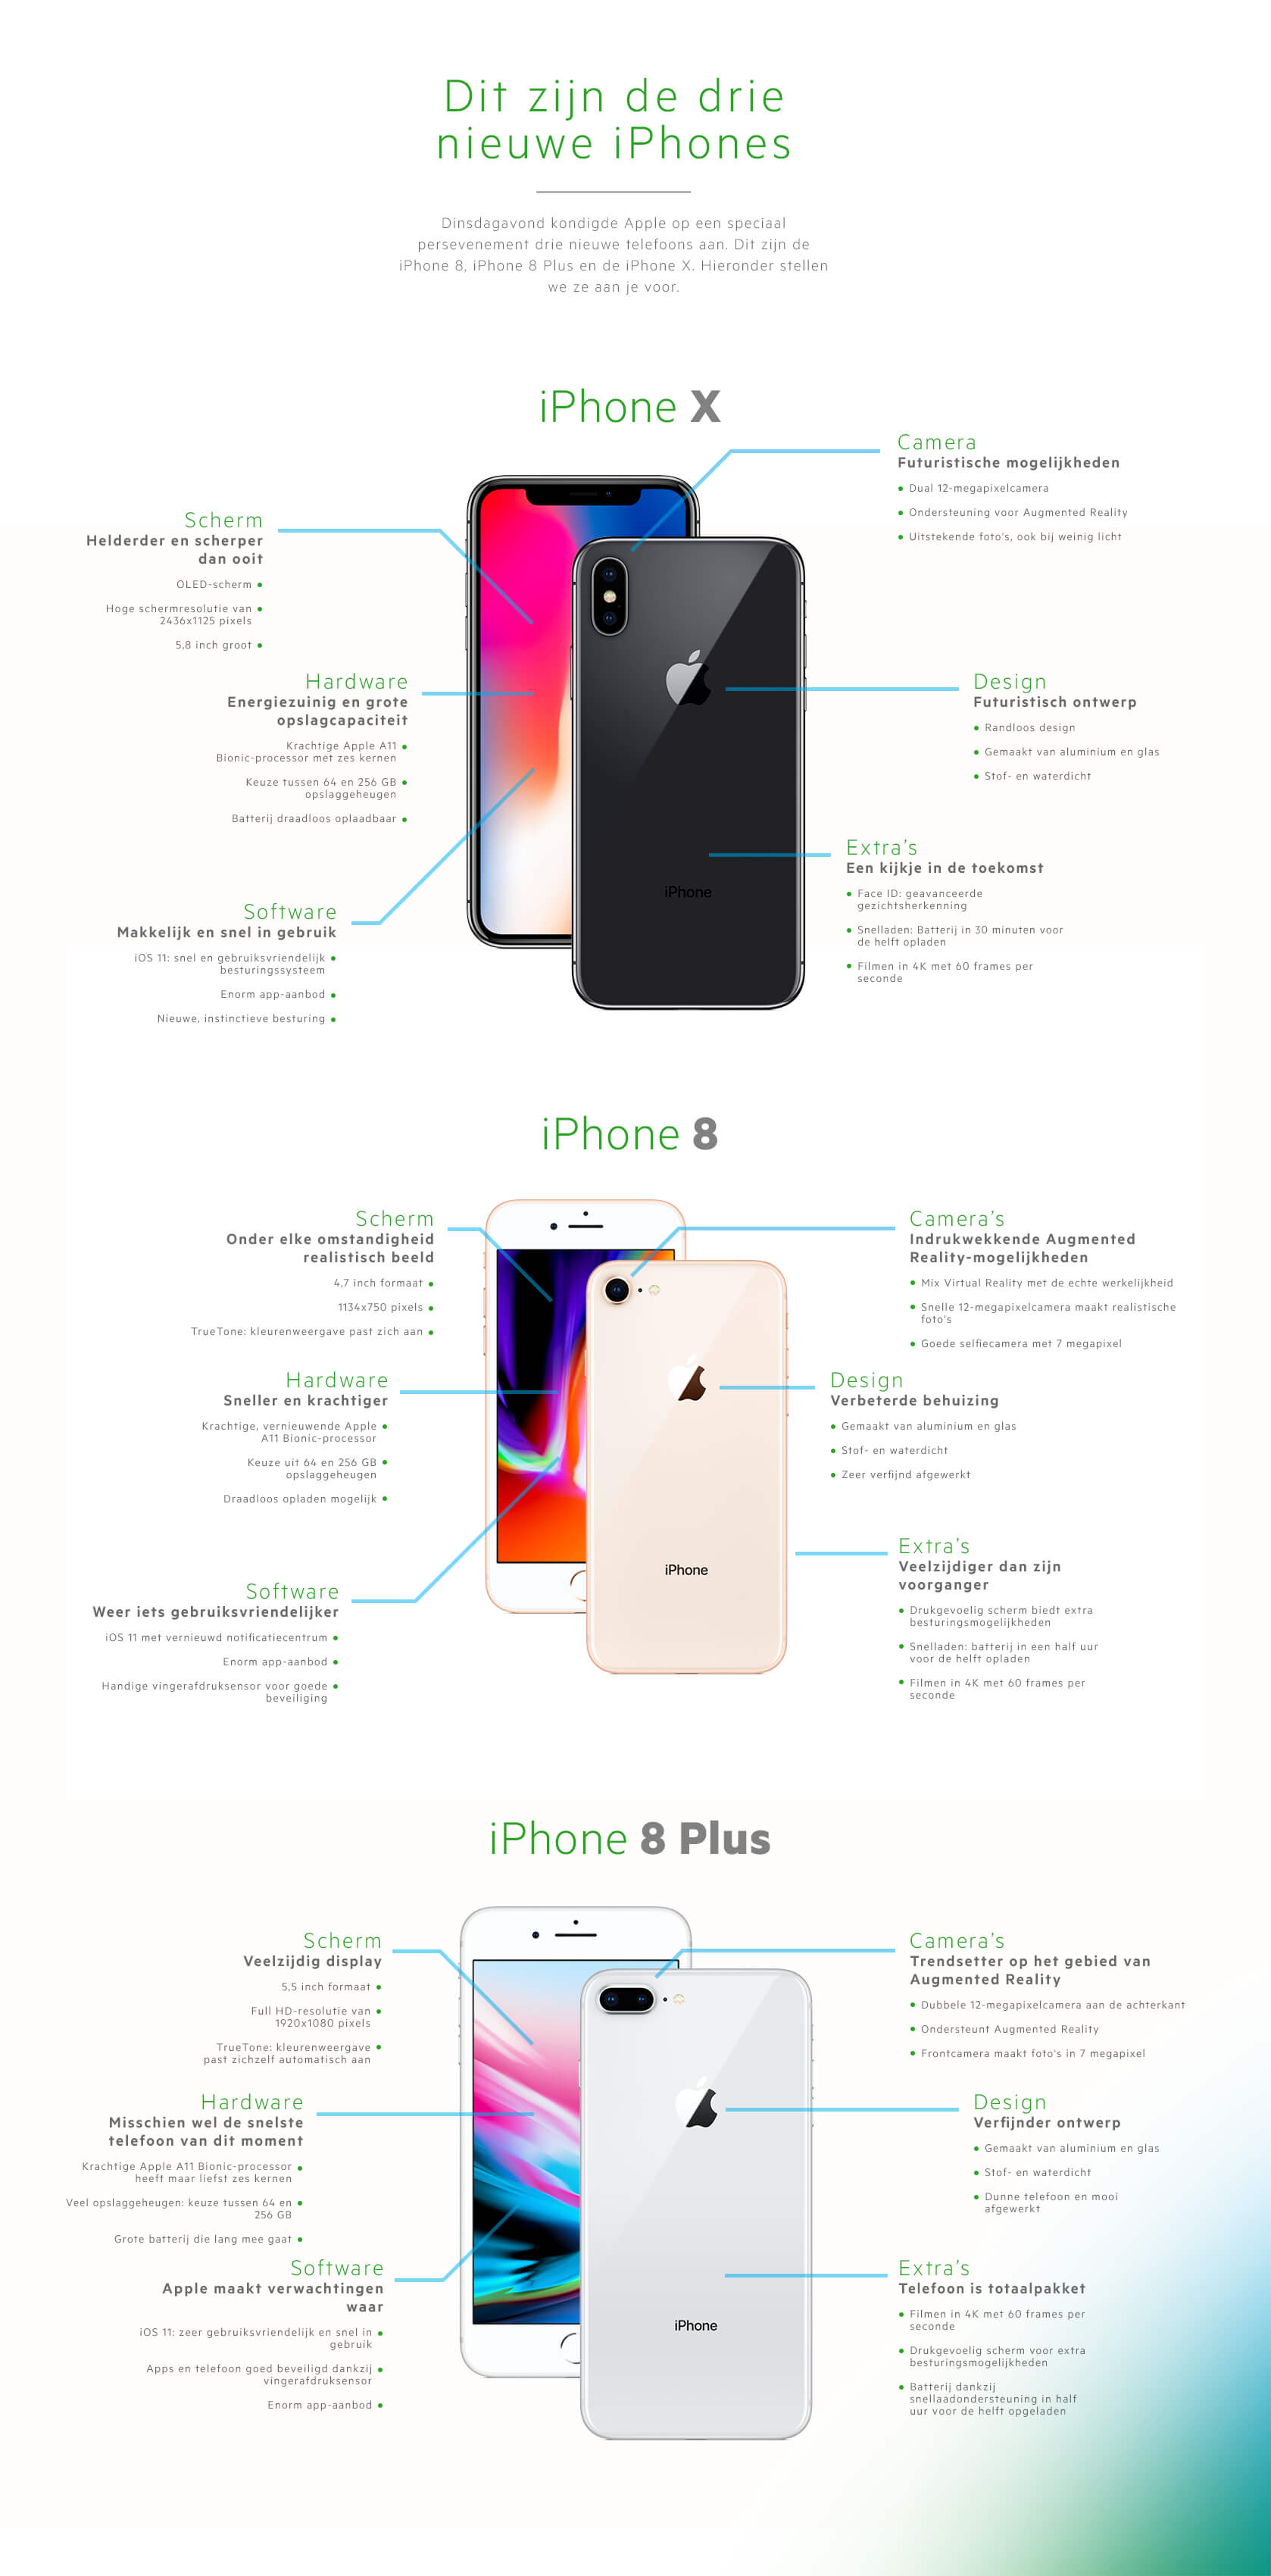 iPhone 8 en iPhone X uitgelegd